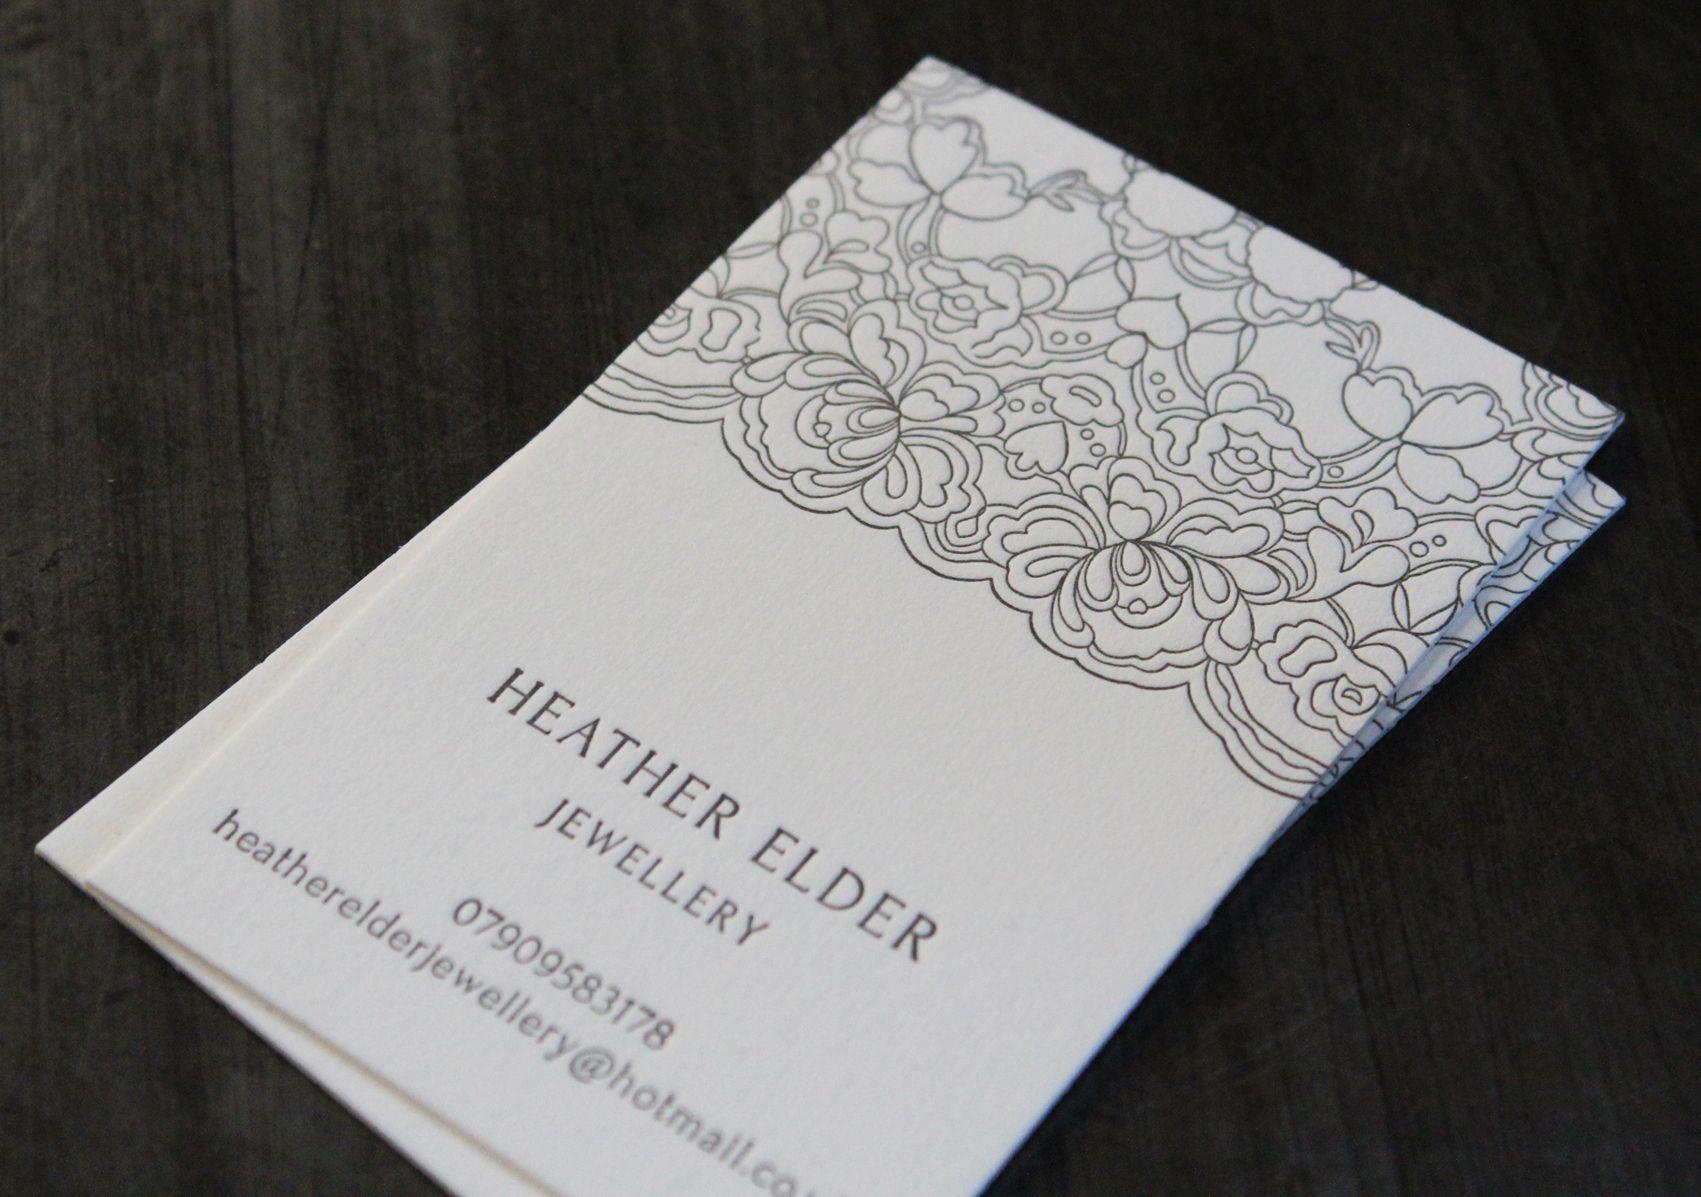 Business cards for heather elder jewellery letterpress printed on business cards for heather elder jewellery letterpress printed on 100 cotton saunders waterford stock letterpress jewellery branding colourmoves